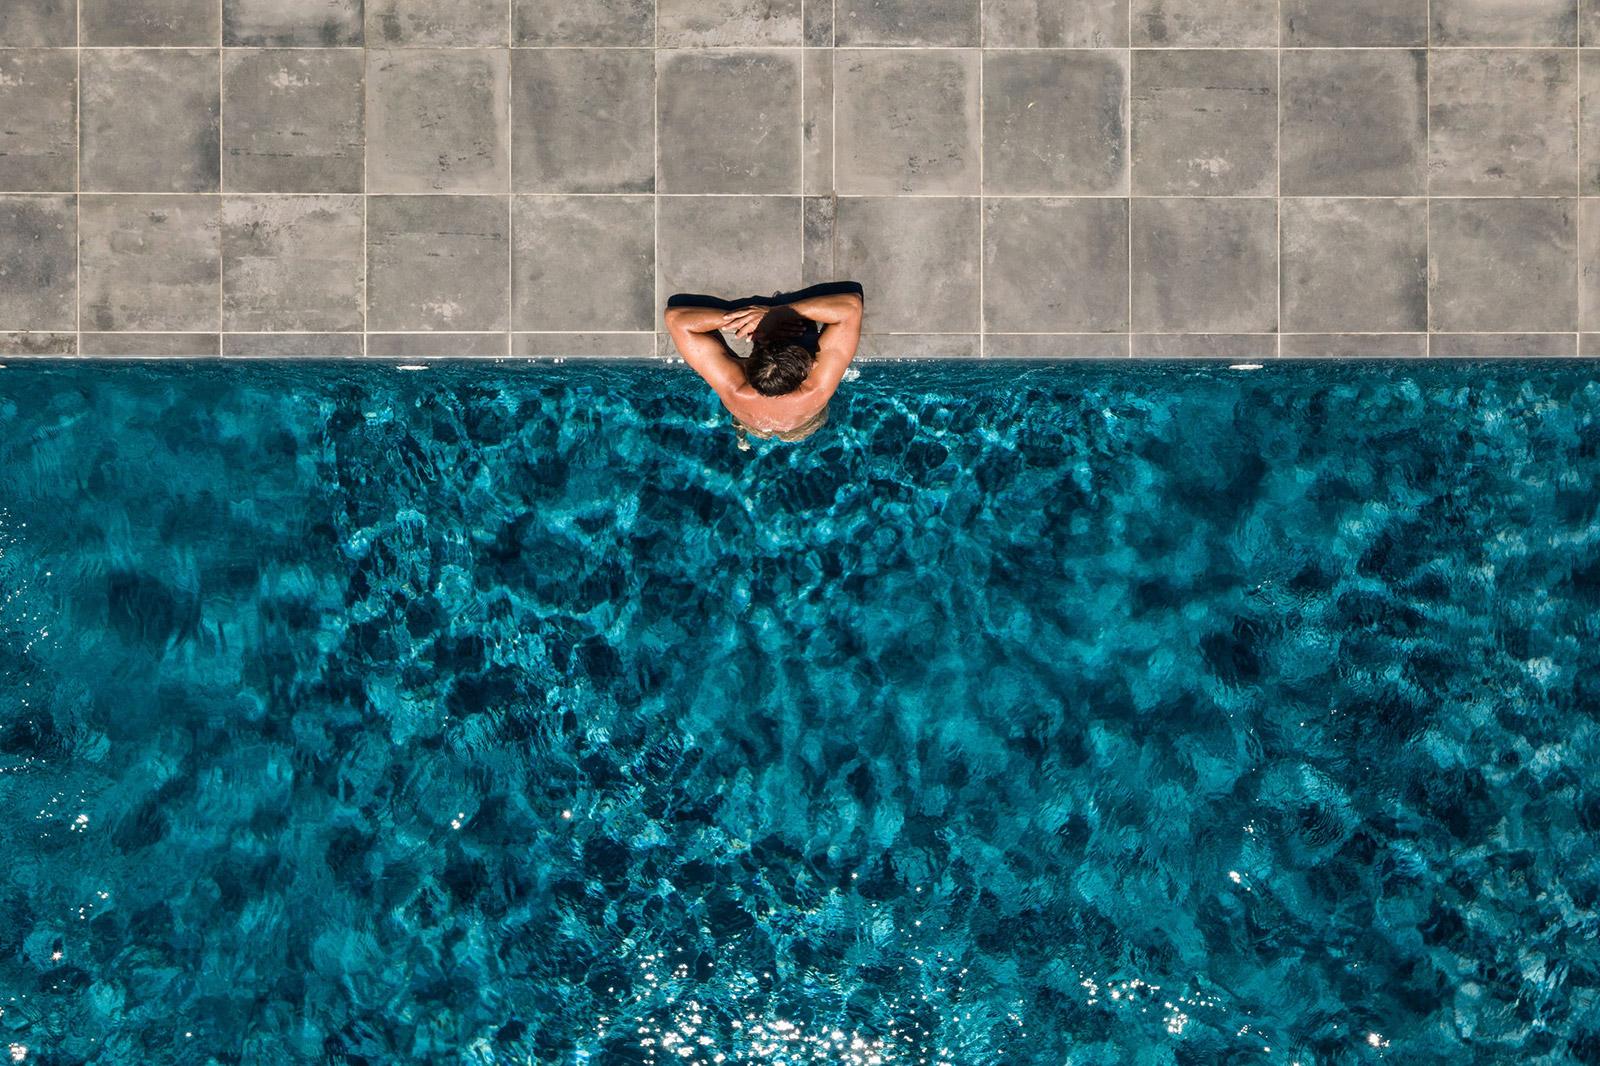 Guy in pool at Lua Nua, Alentejo, Portugal